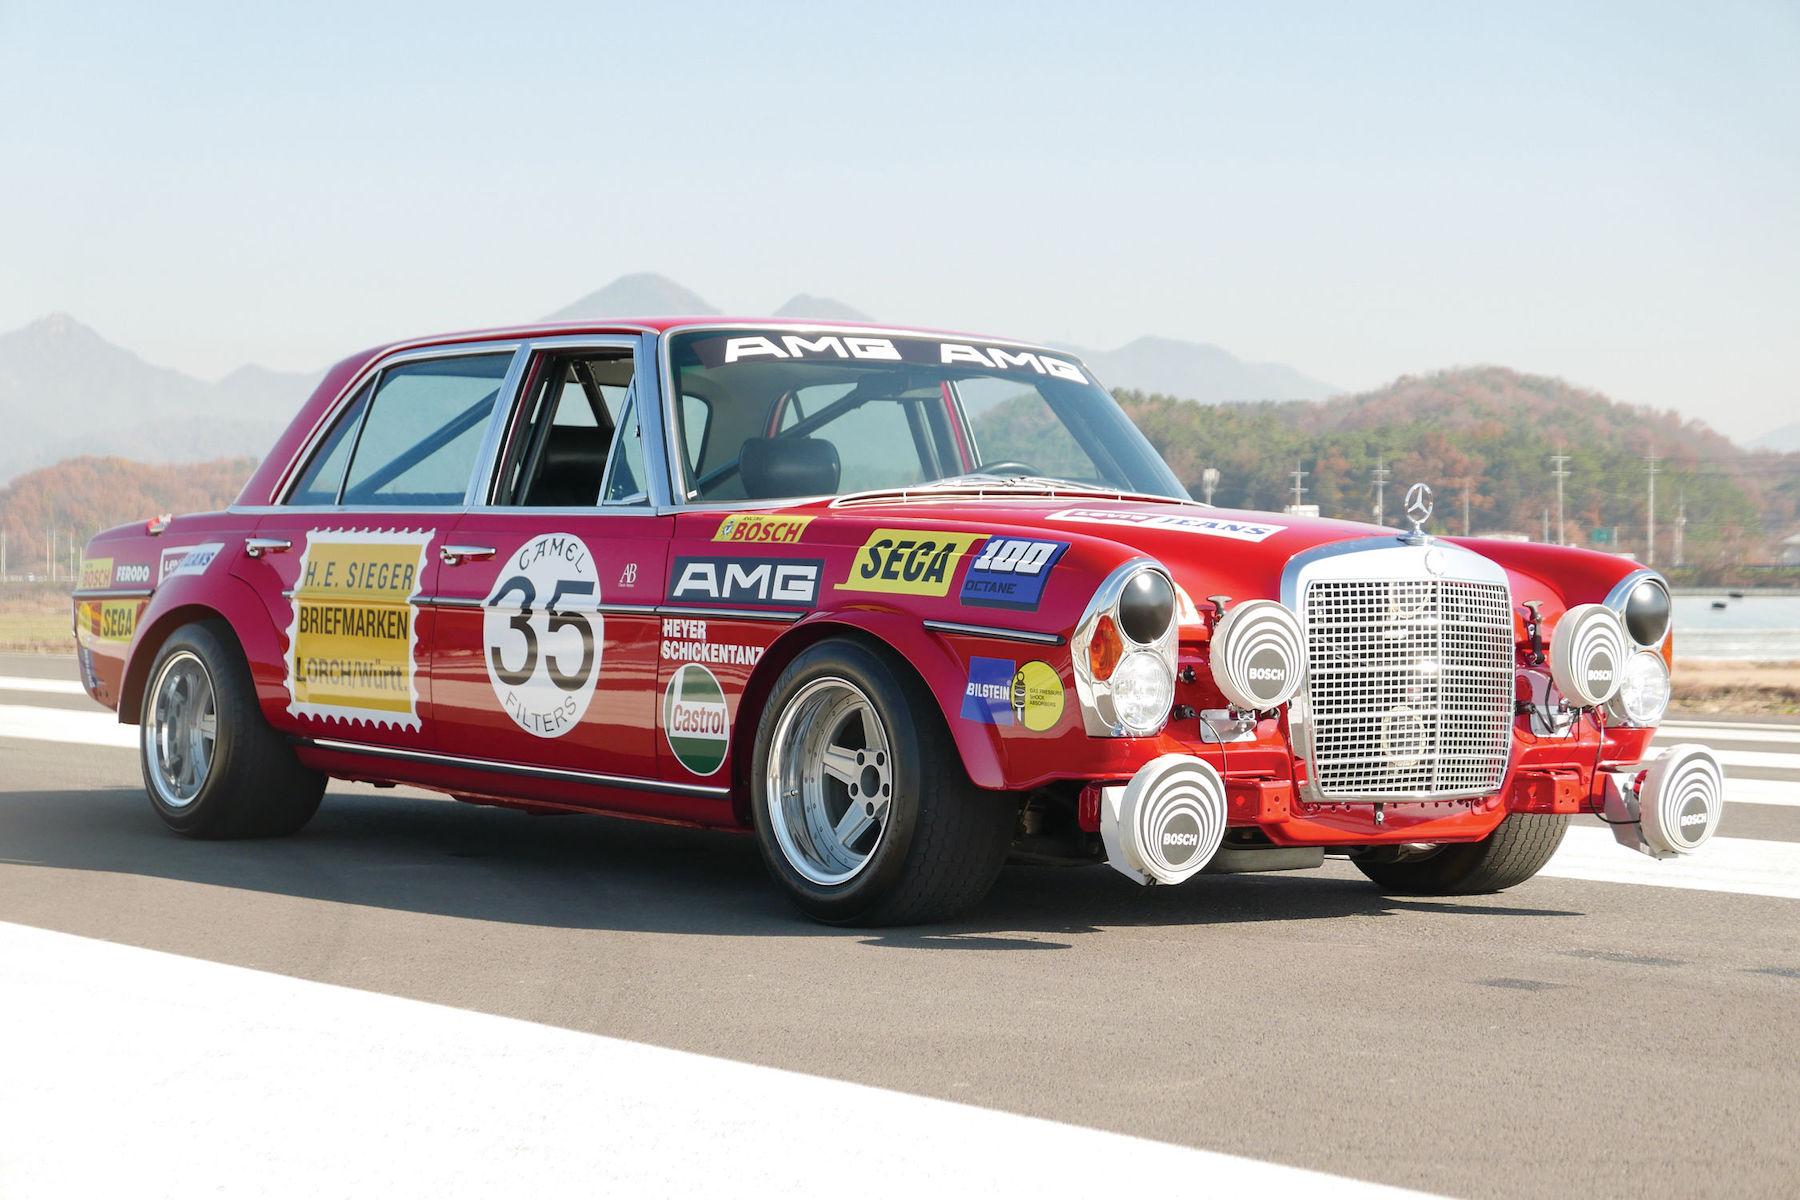 Petrolhead Corner - Mercedes 300 SEL 6.8 AMG red pig - 2